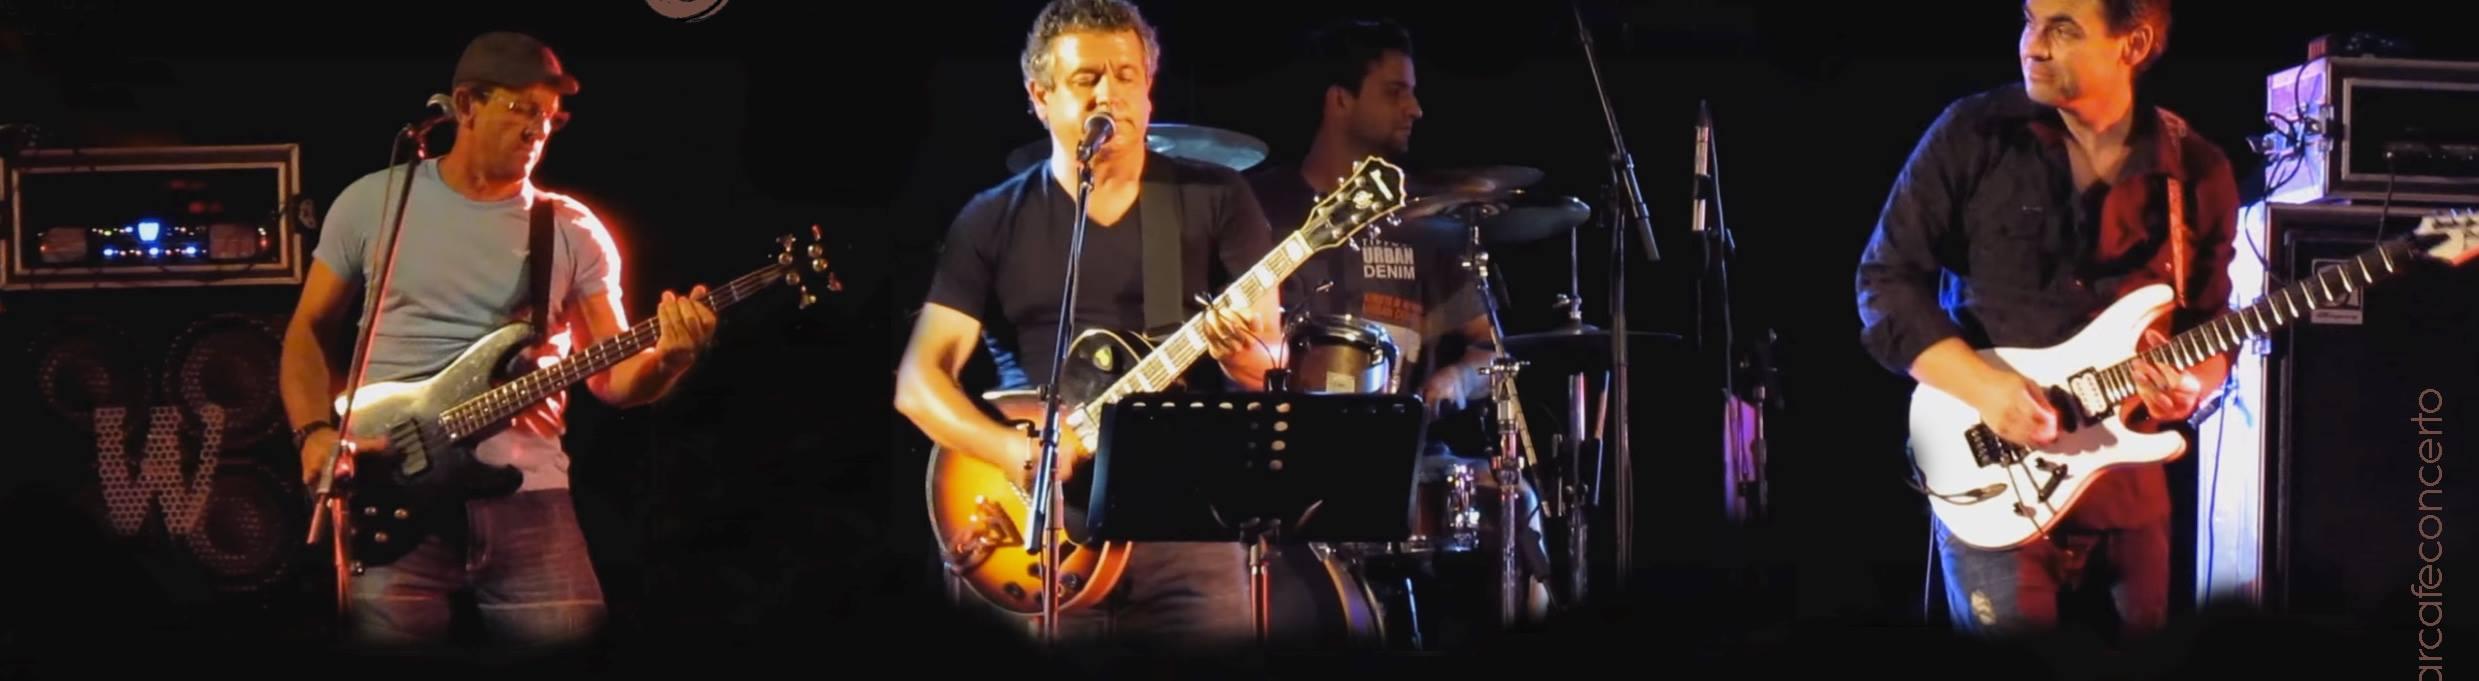 Concerto Drive-In com Virá Lomba (CANCELADO)